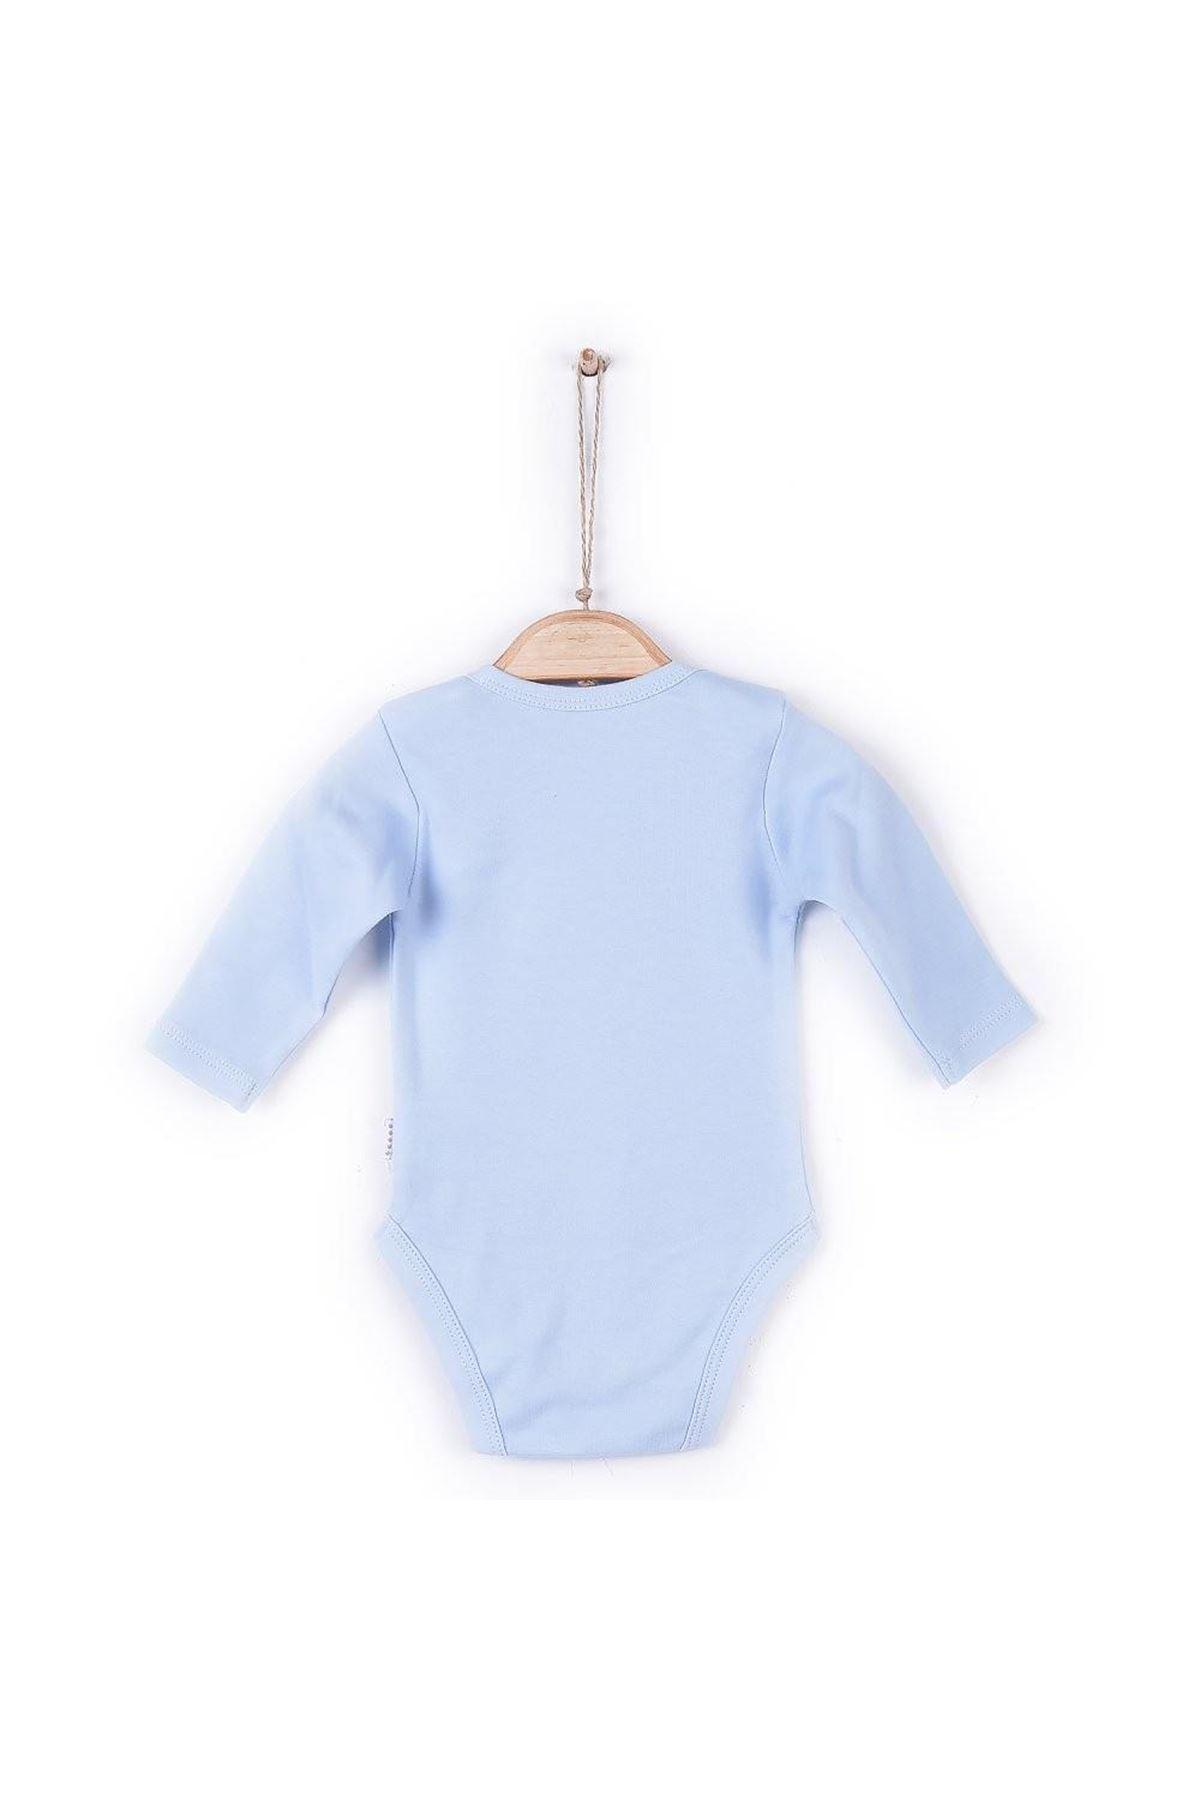 KitiKate Organik Uzun Kol Amerikan Yaka Body 57195 Mavi